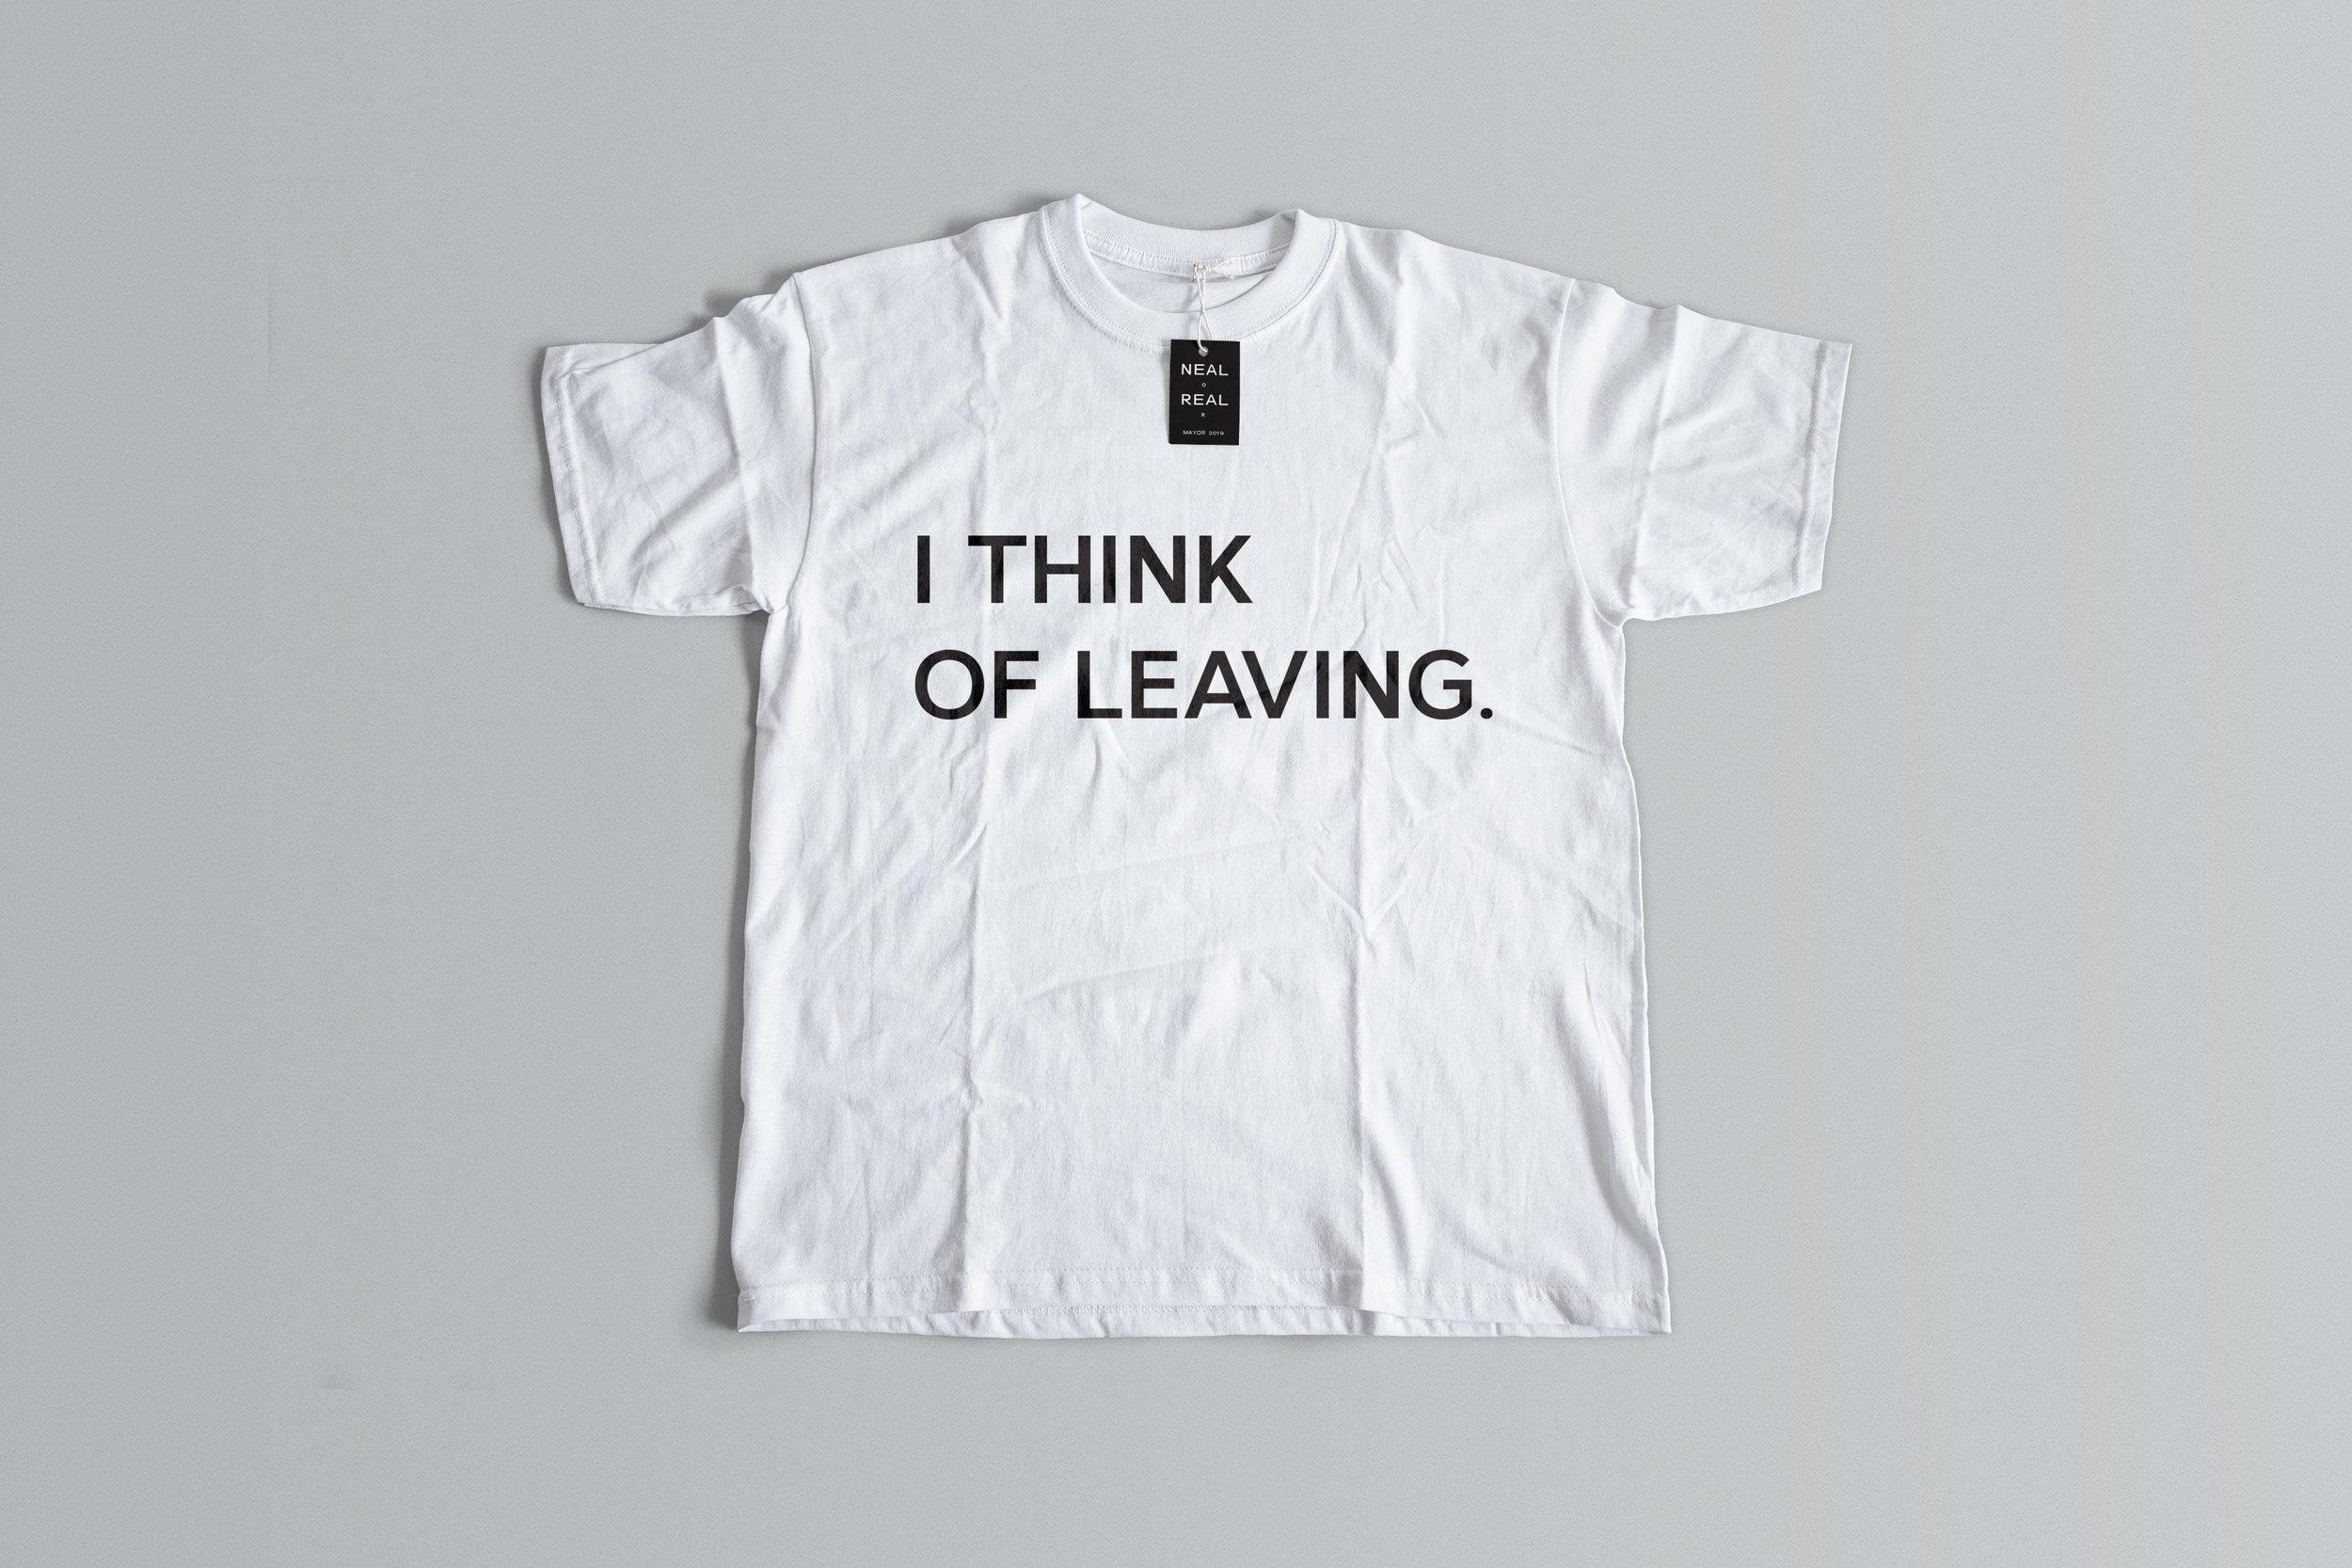 3D_shirt-i-think-of-leaving_3886.jpg